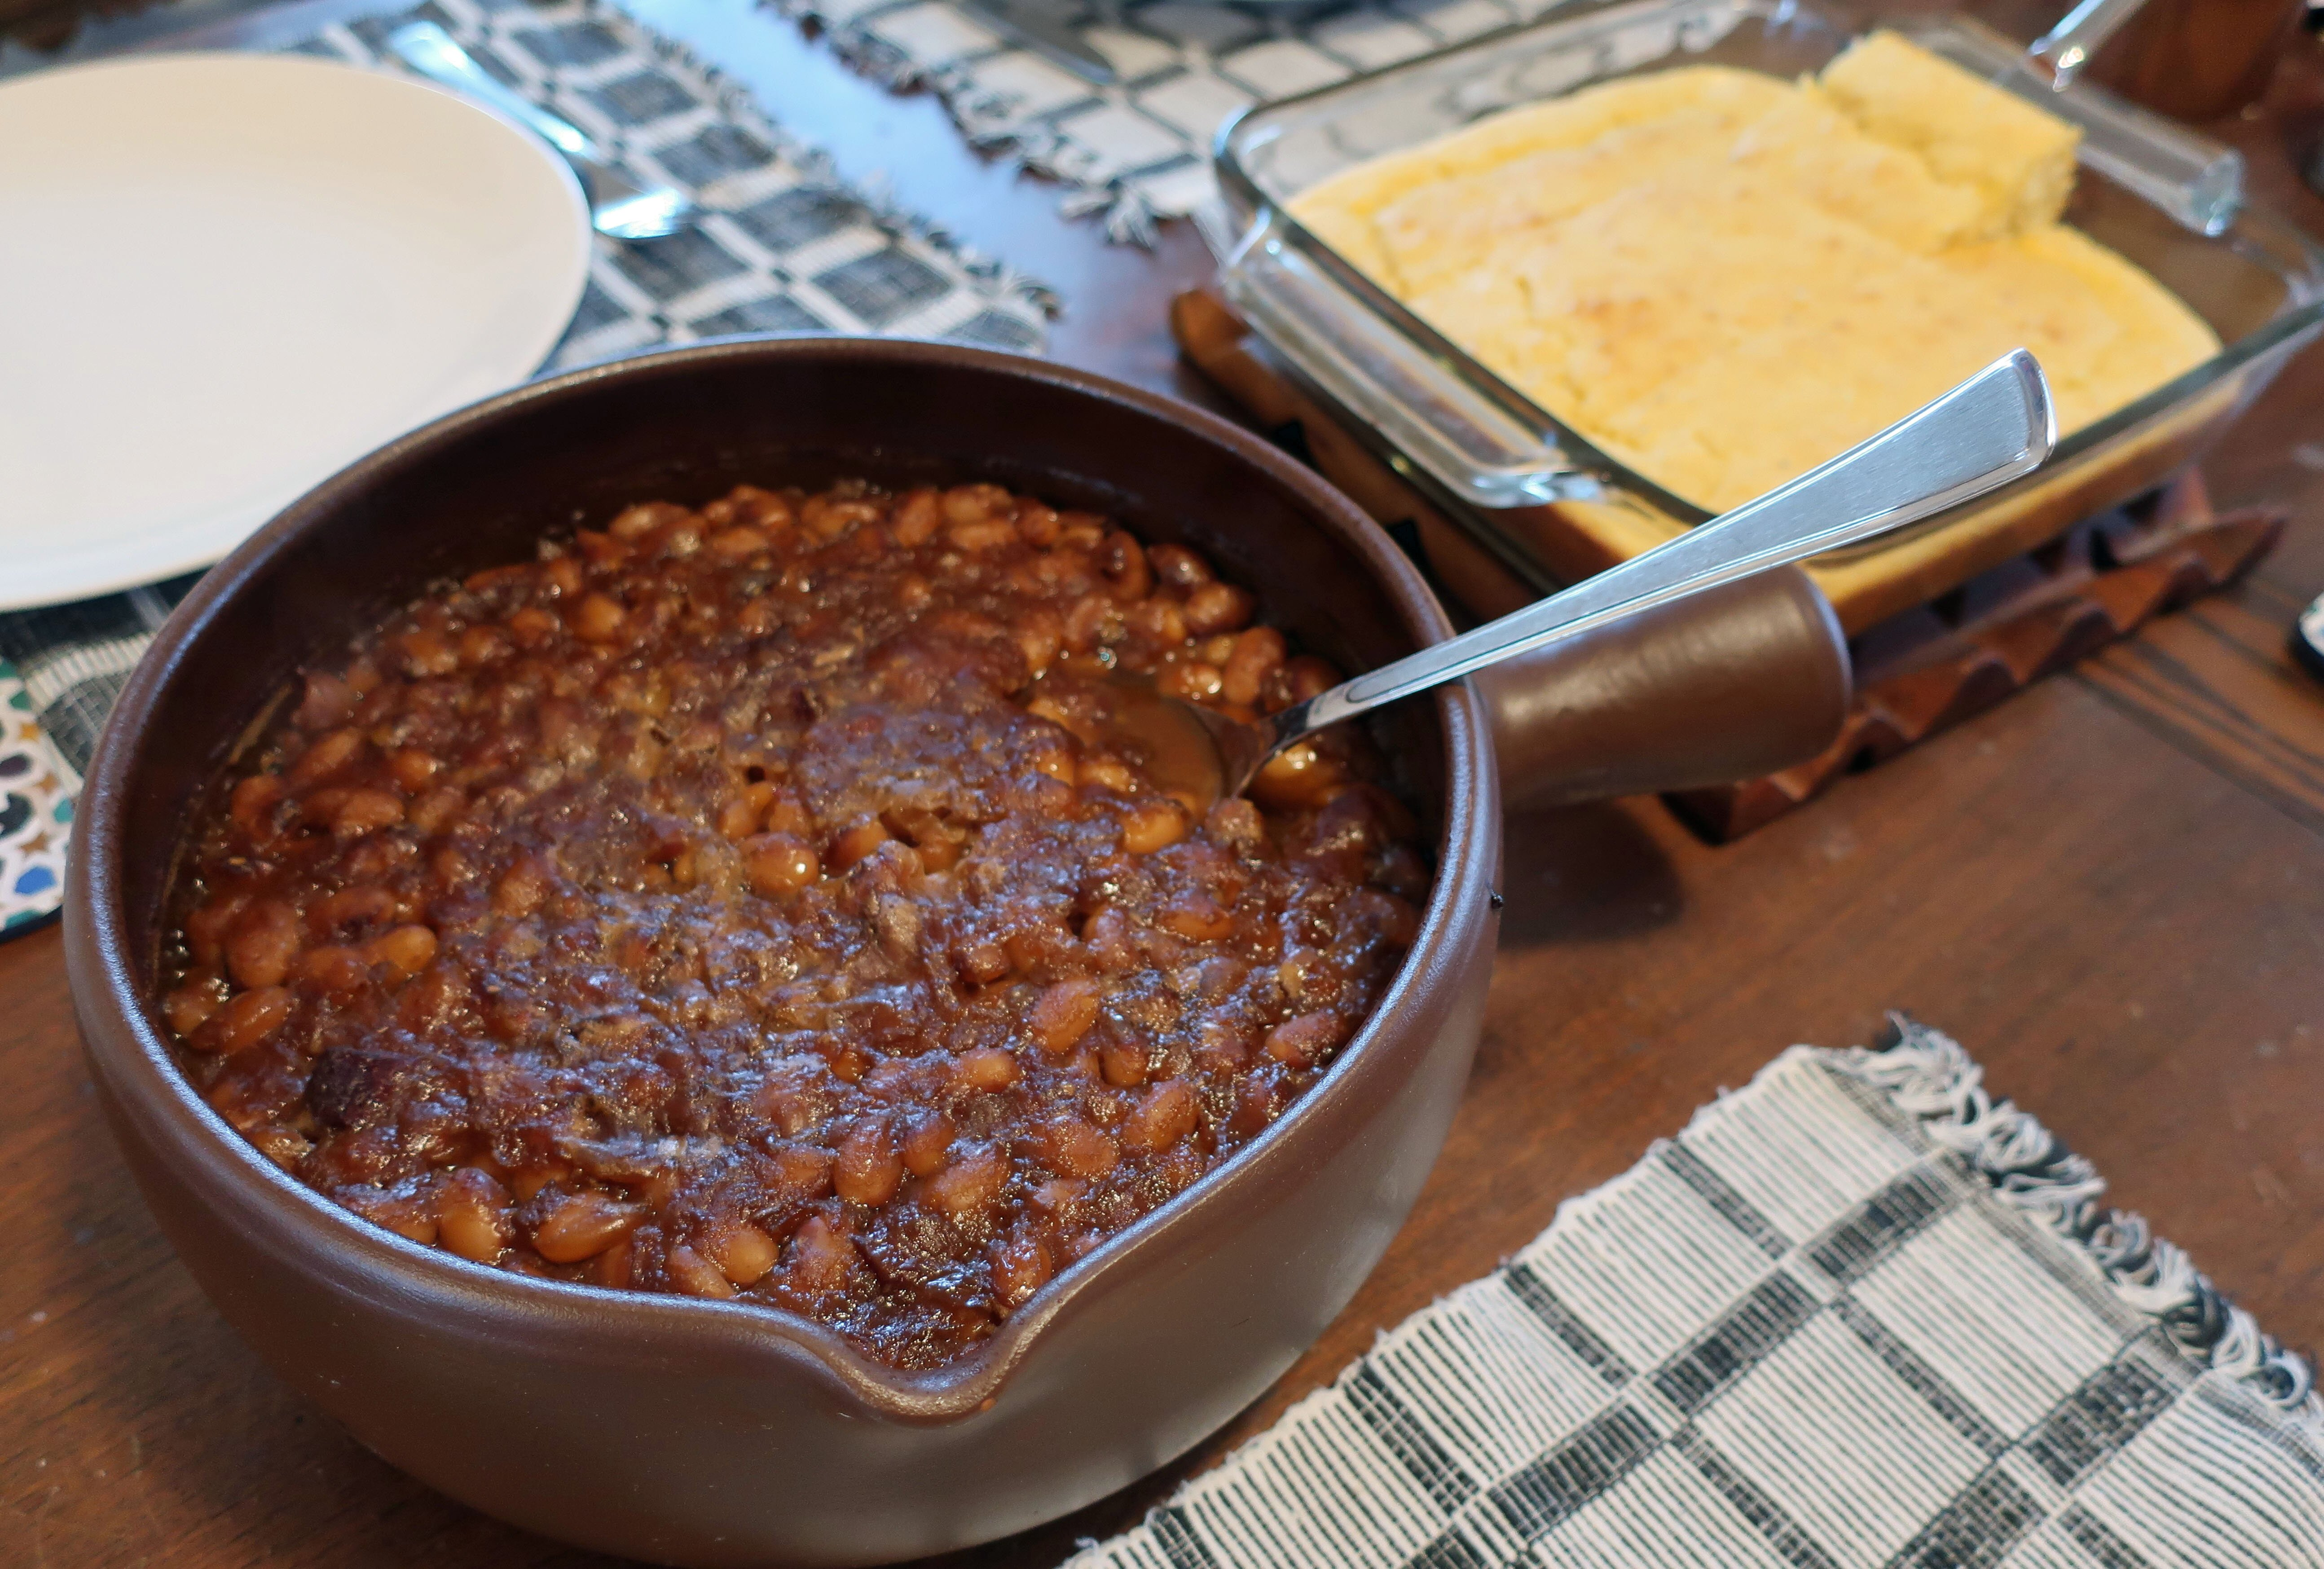 chef johns boston baked beans